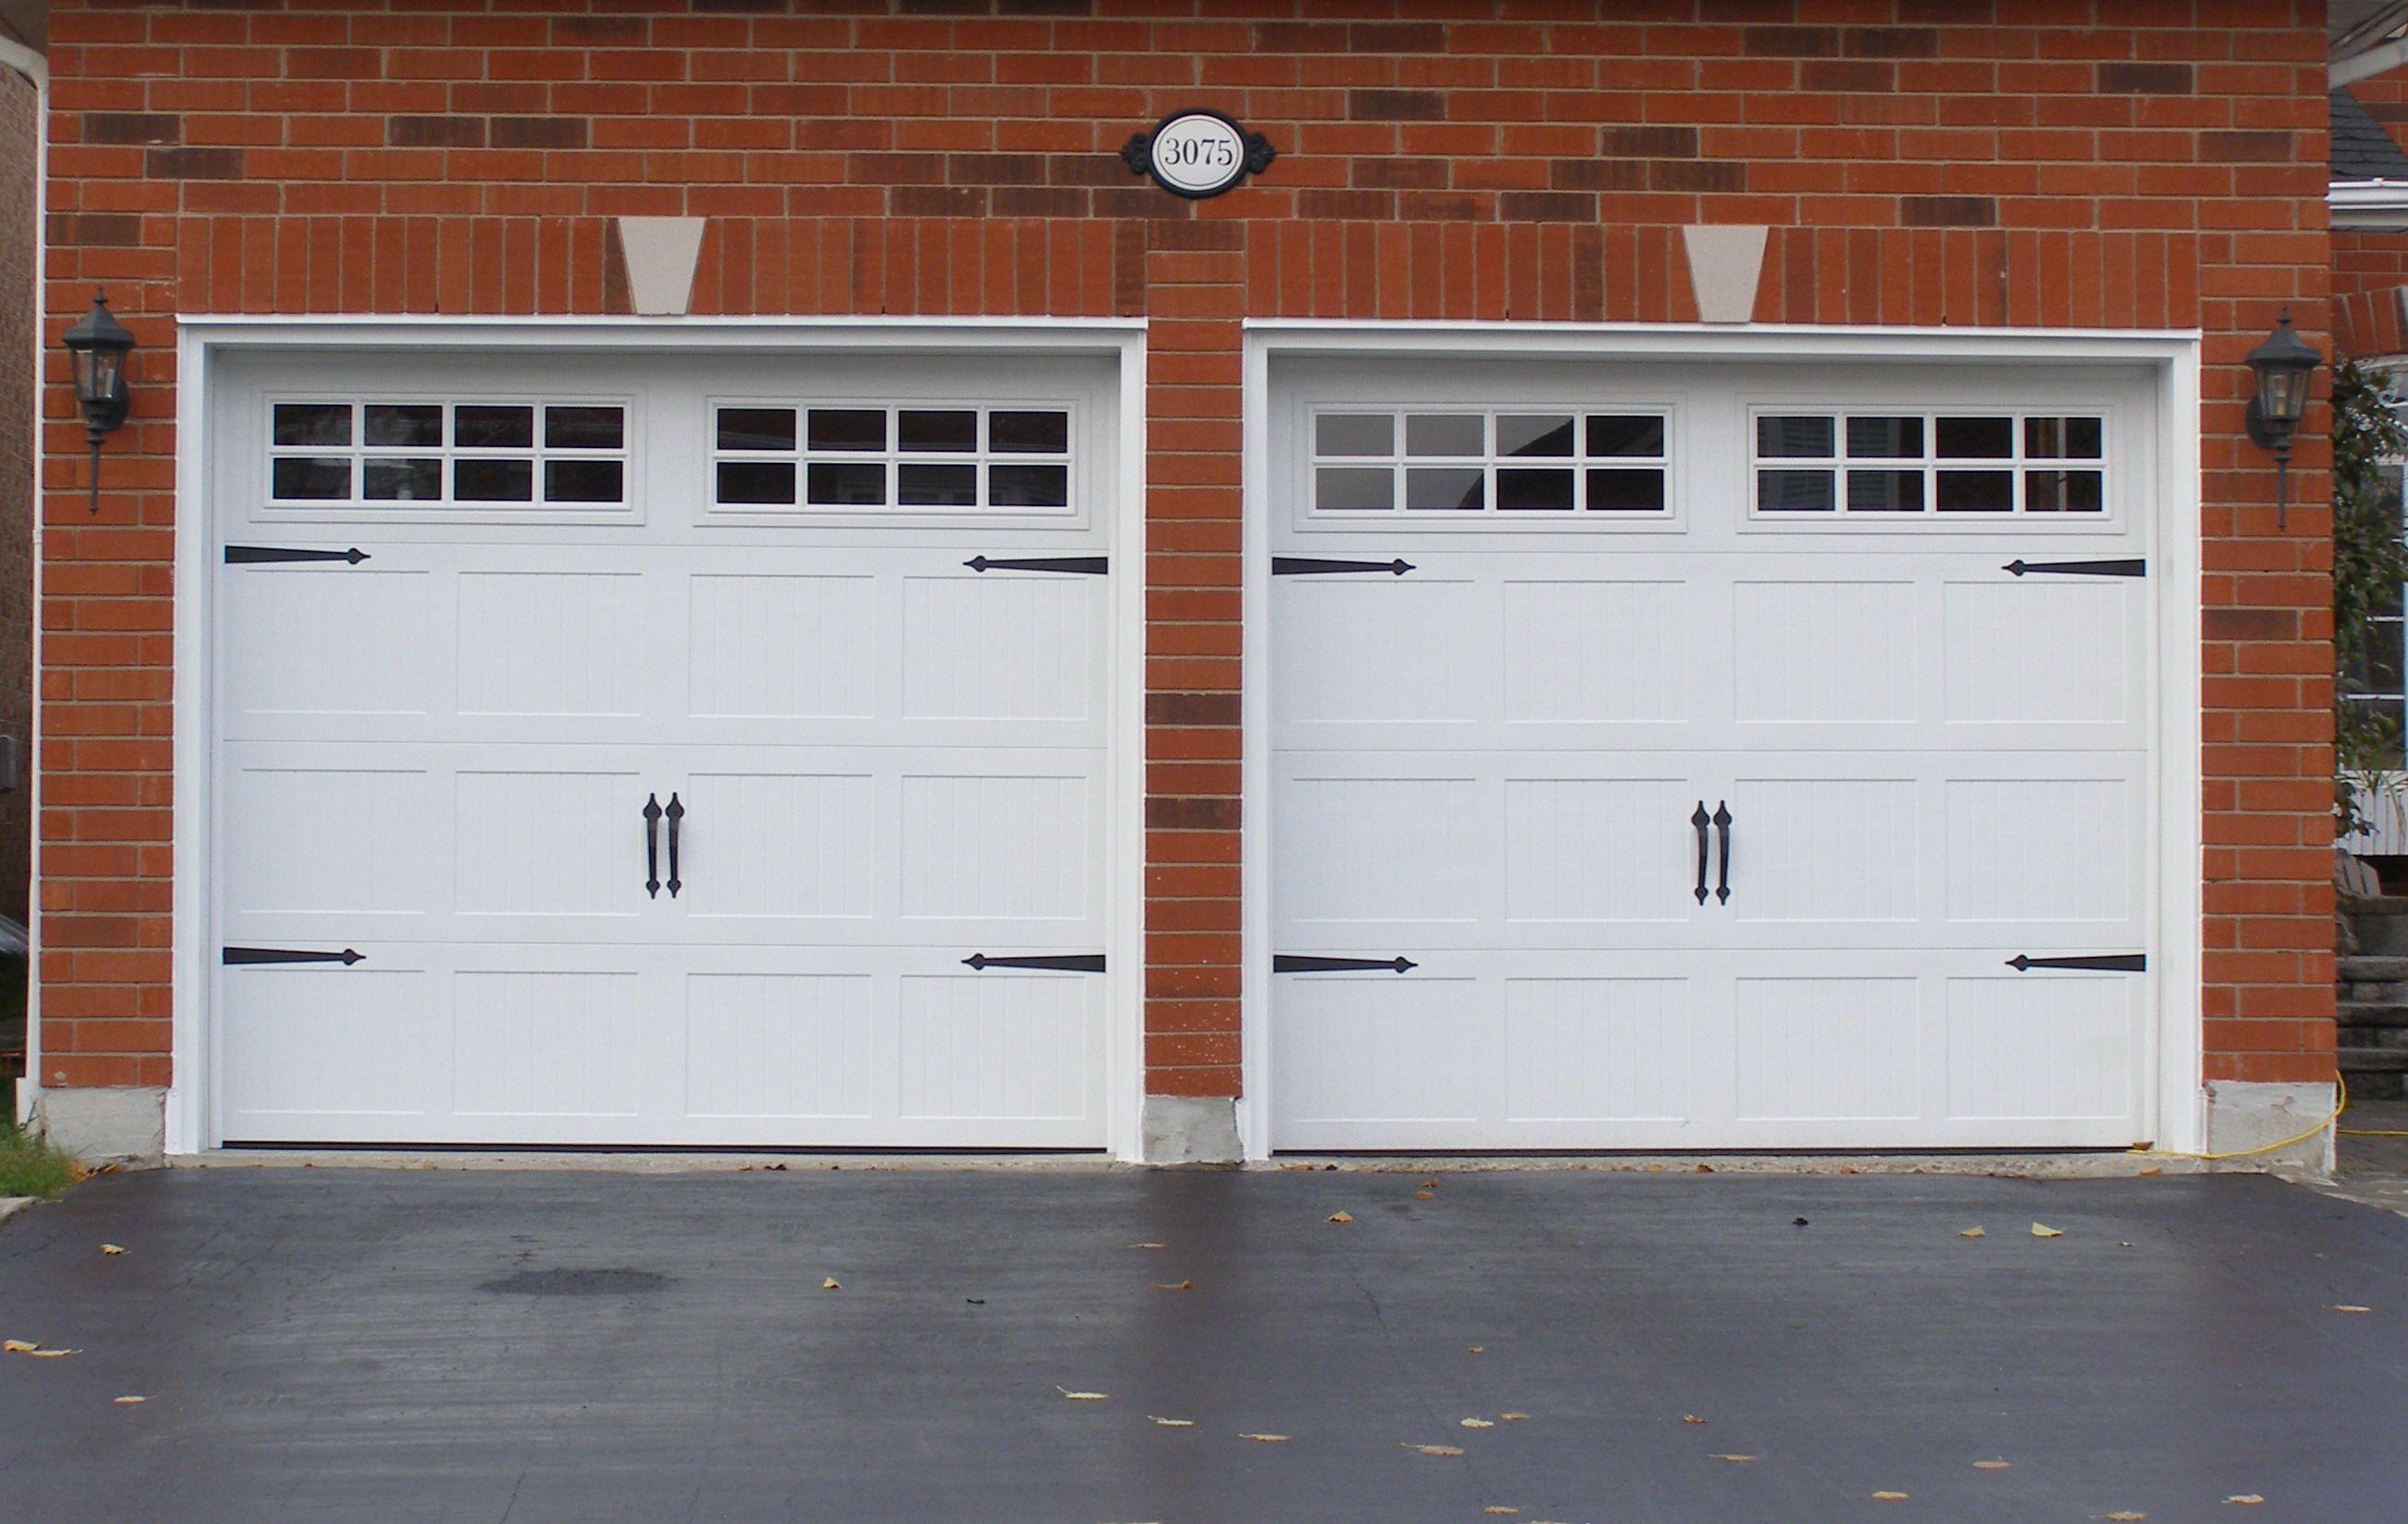 Local Garage Door Repair Installation Business Providing Garage Door Repair Openers Torsion Springs Cables Pulleys Repair Off Garagentore Moderne Garage